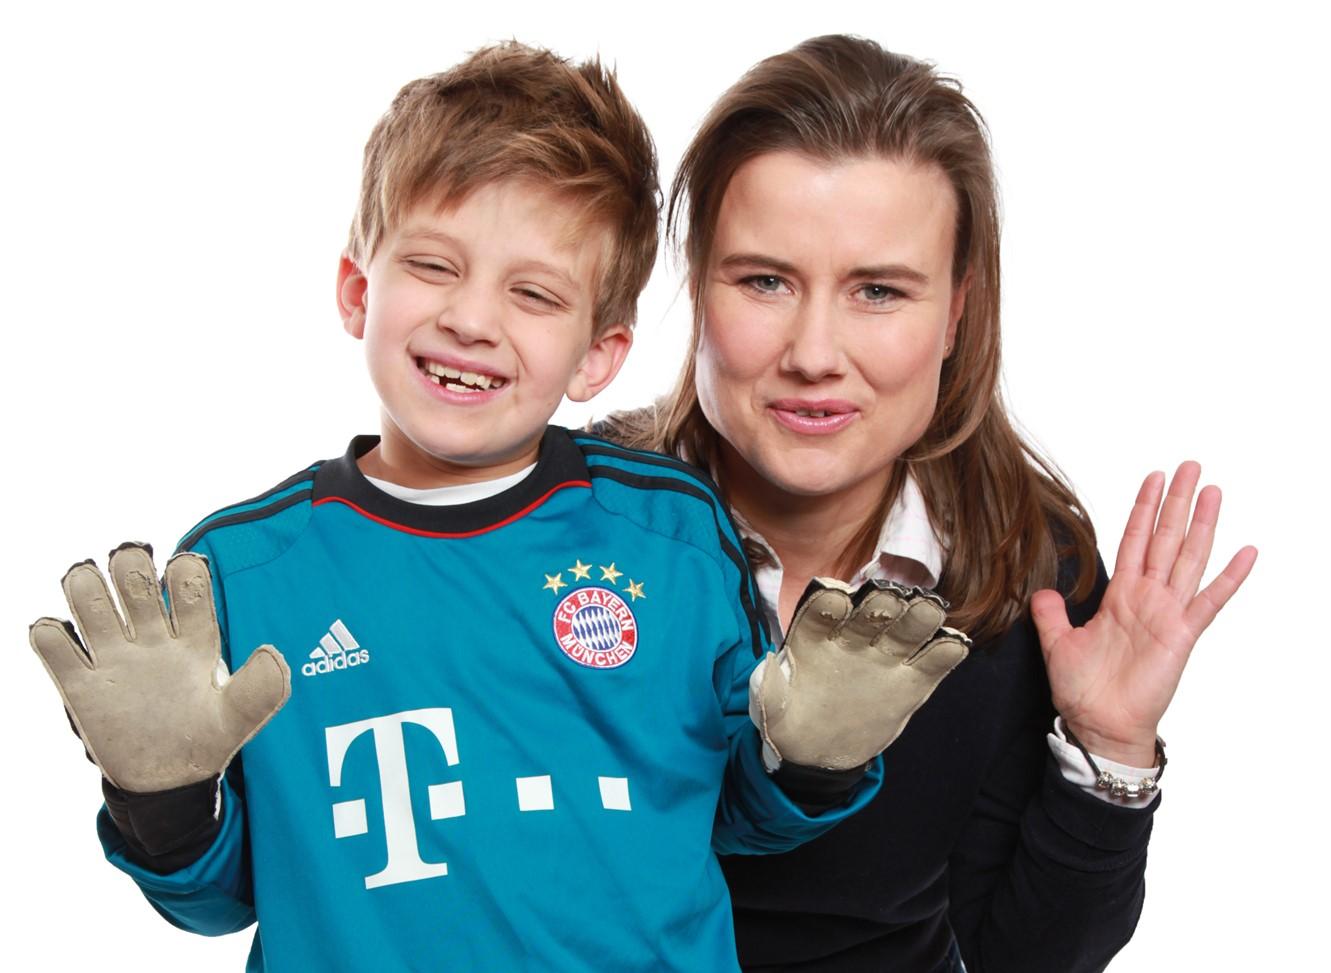 NF Familie Kinder Eltern Neurofibromatose Bundesverband